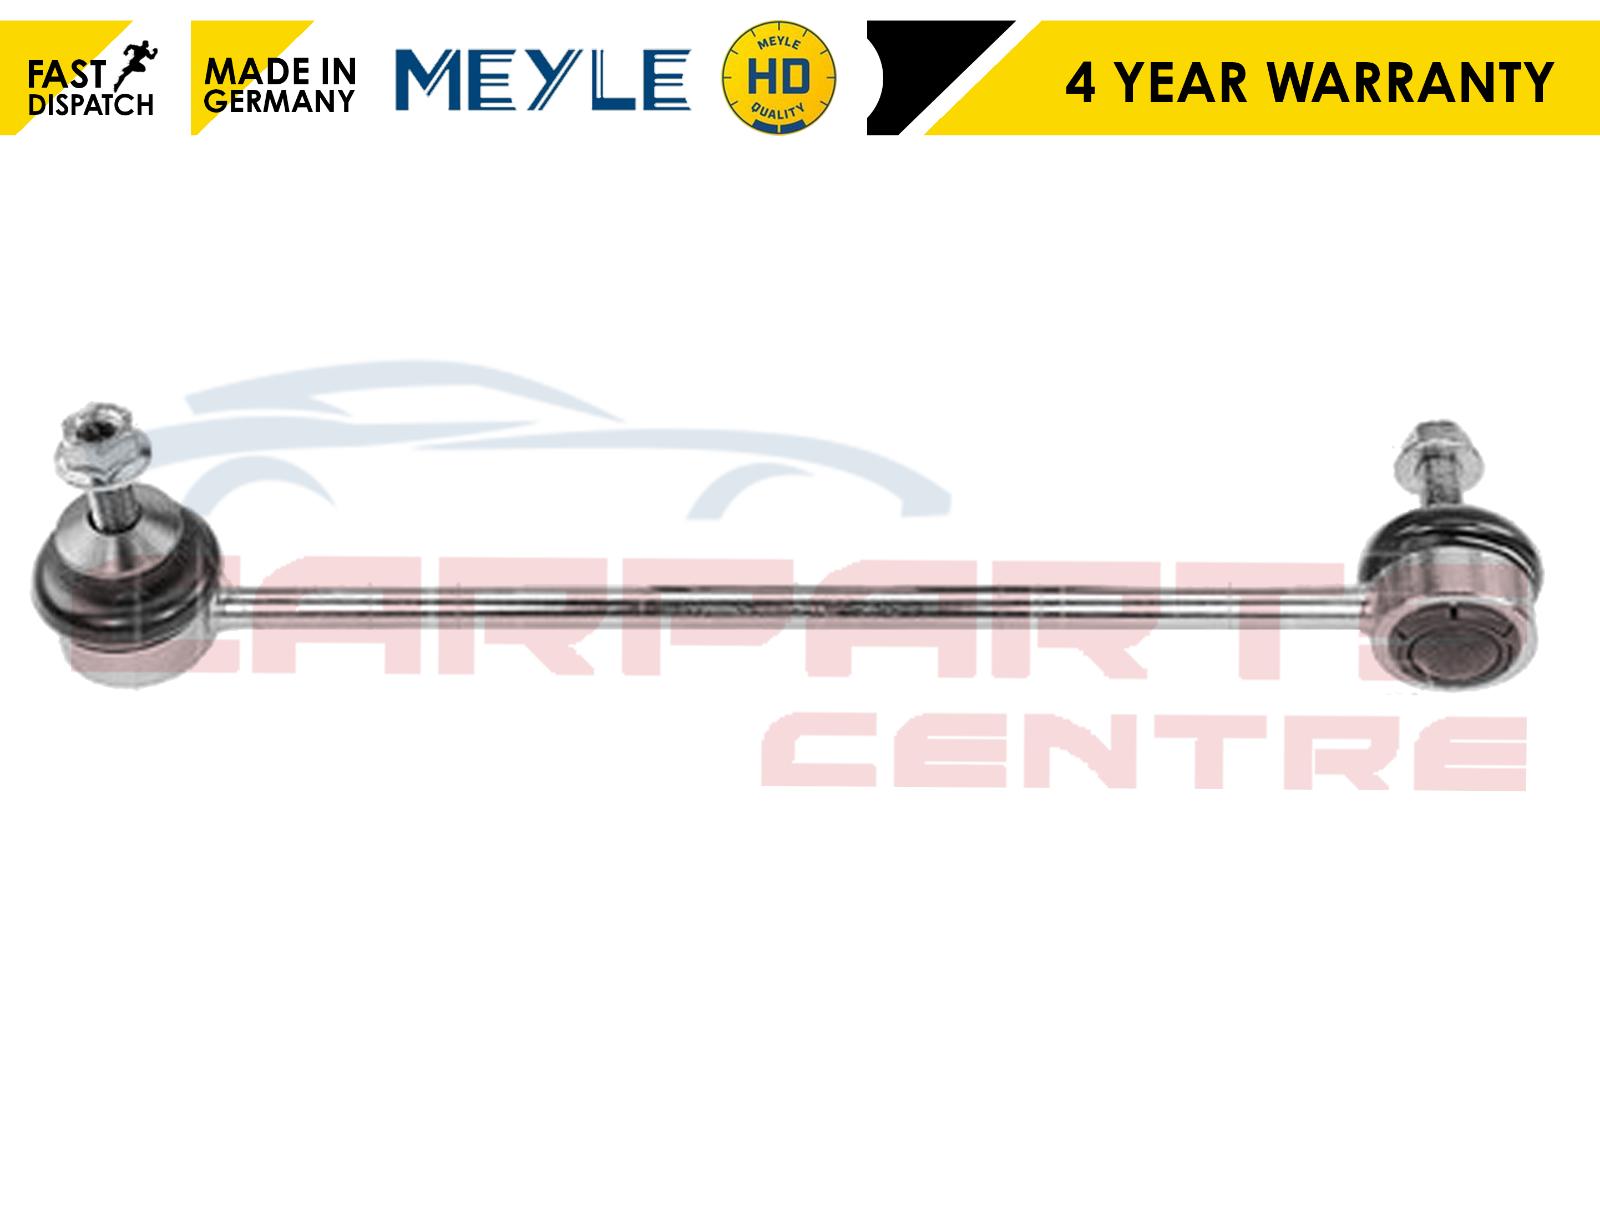 FOR VW FRONT HEAVY DUTY ANTIROLL BAR STABILISER DROP LINK LINKS MEYLE HD NEW